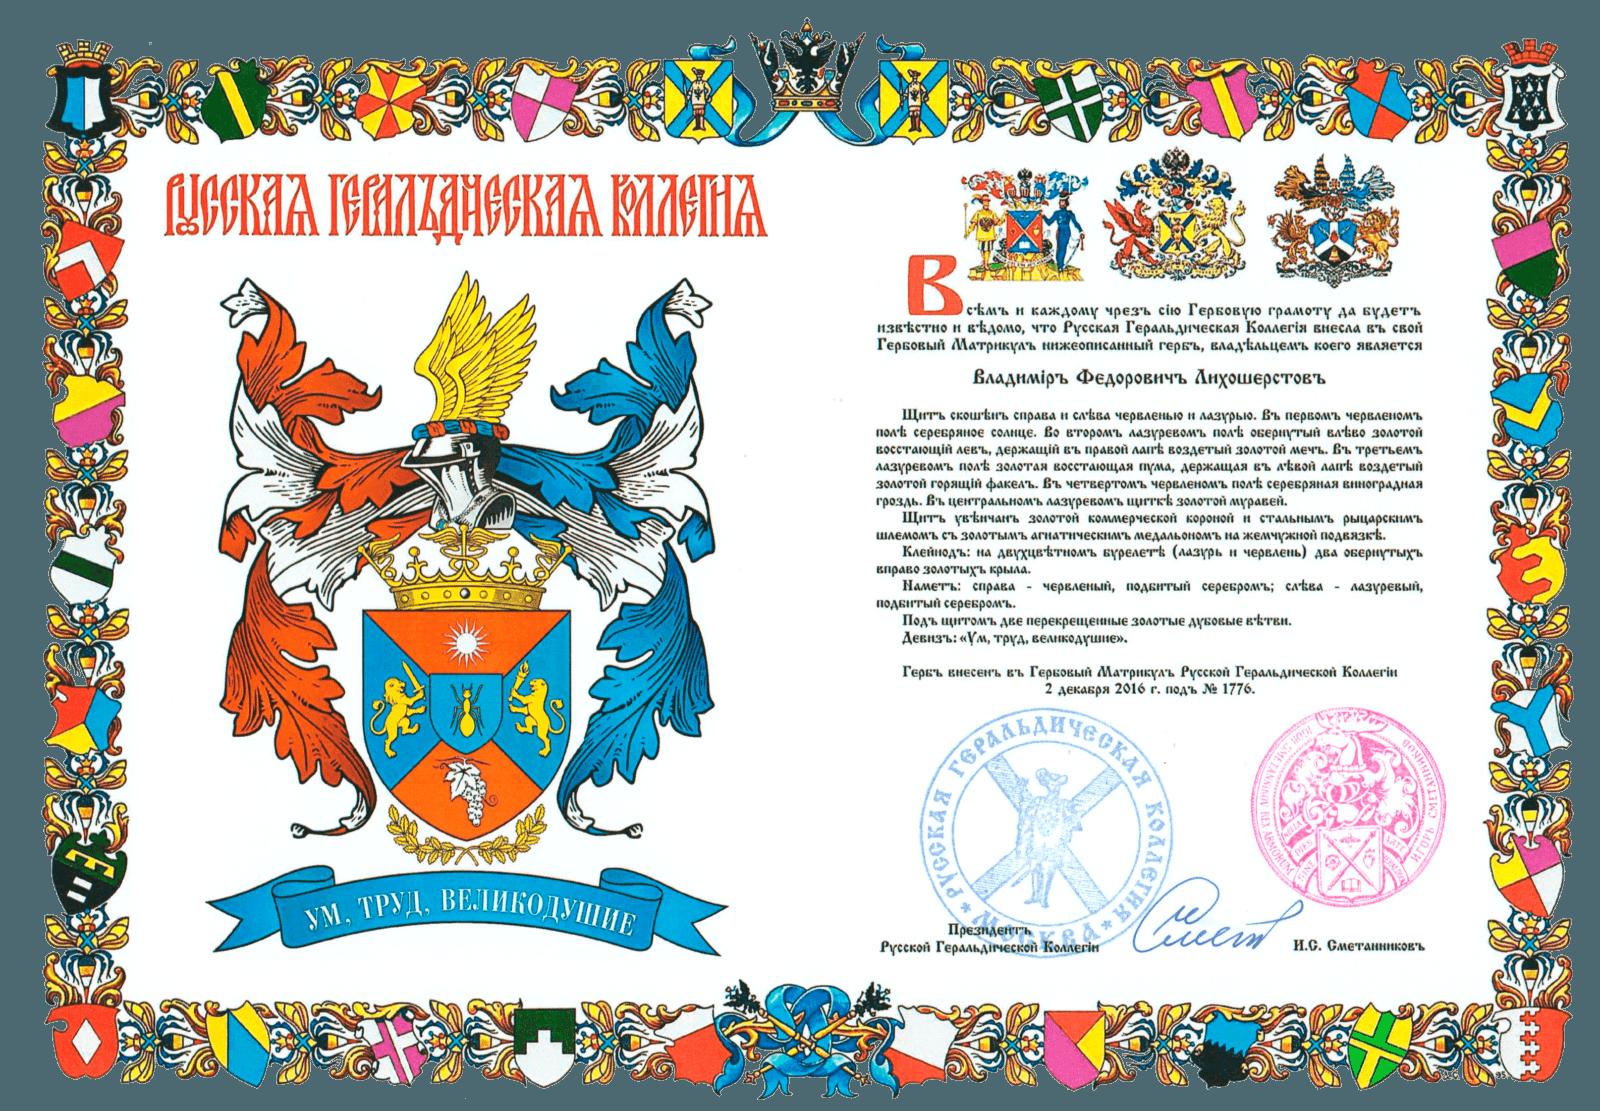 Владимир Фёдорович Лихошерстов